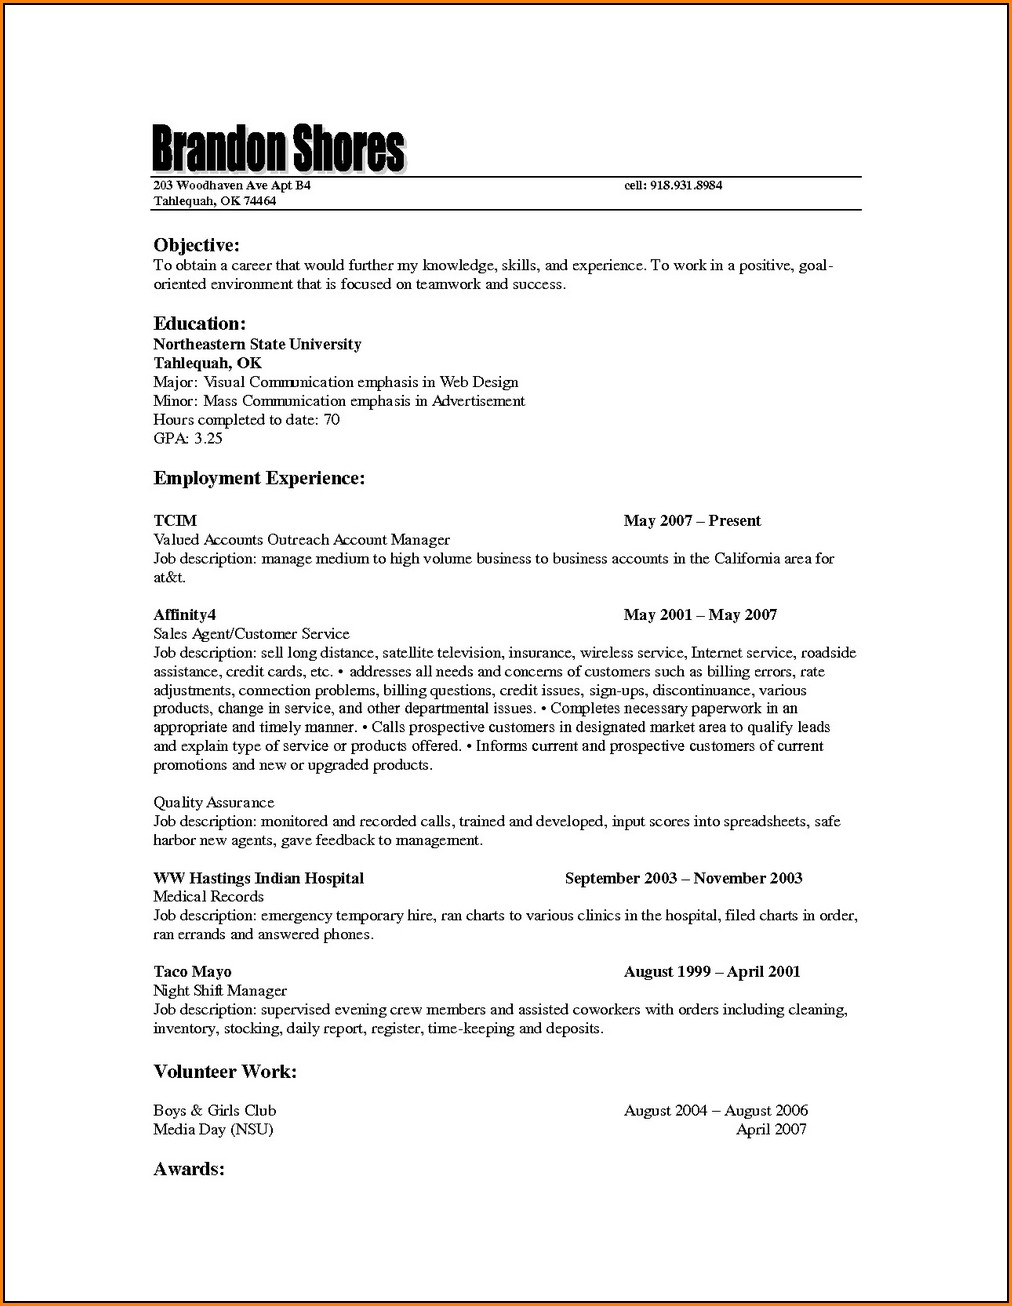 Resume For Life Insurance Agent